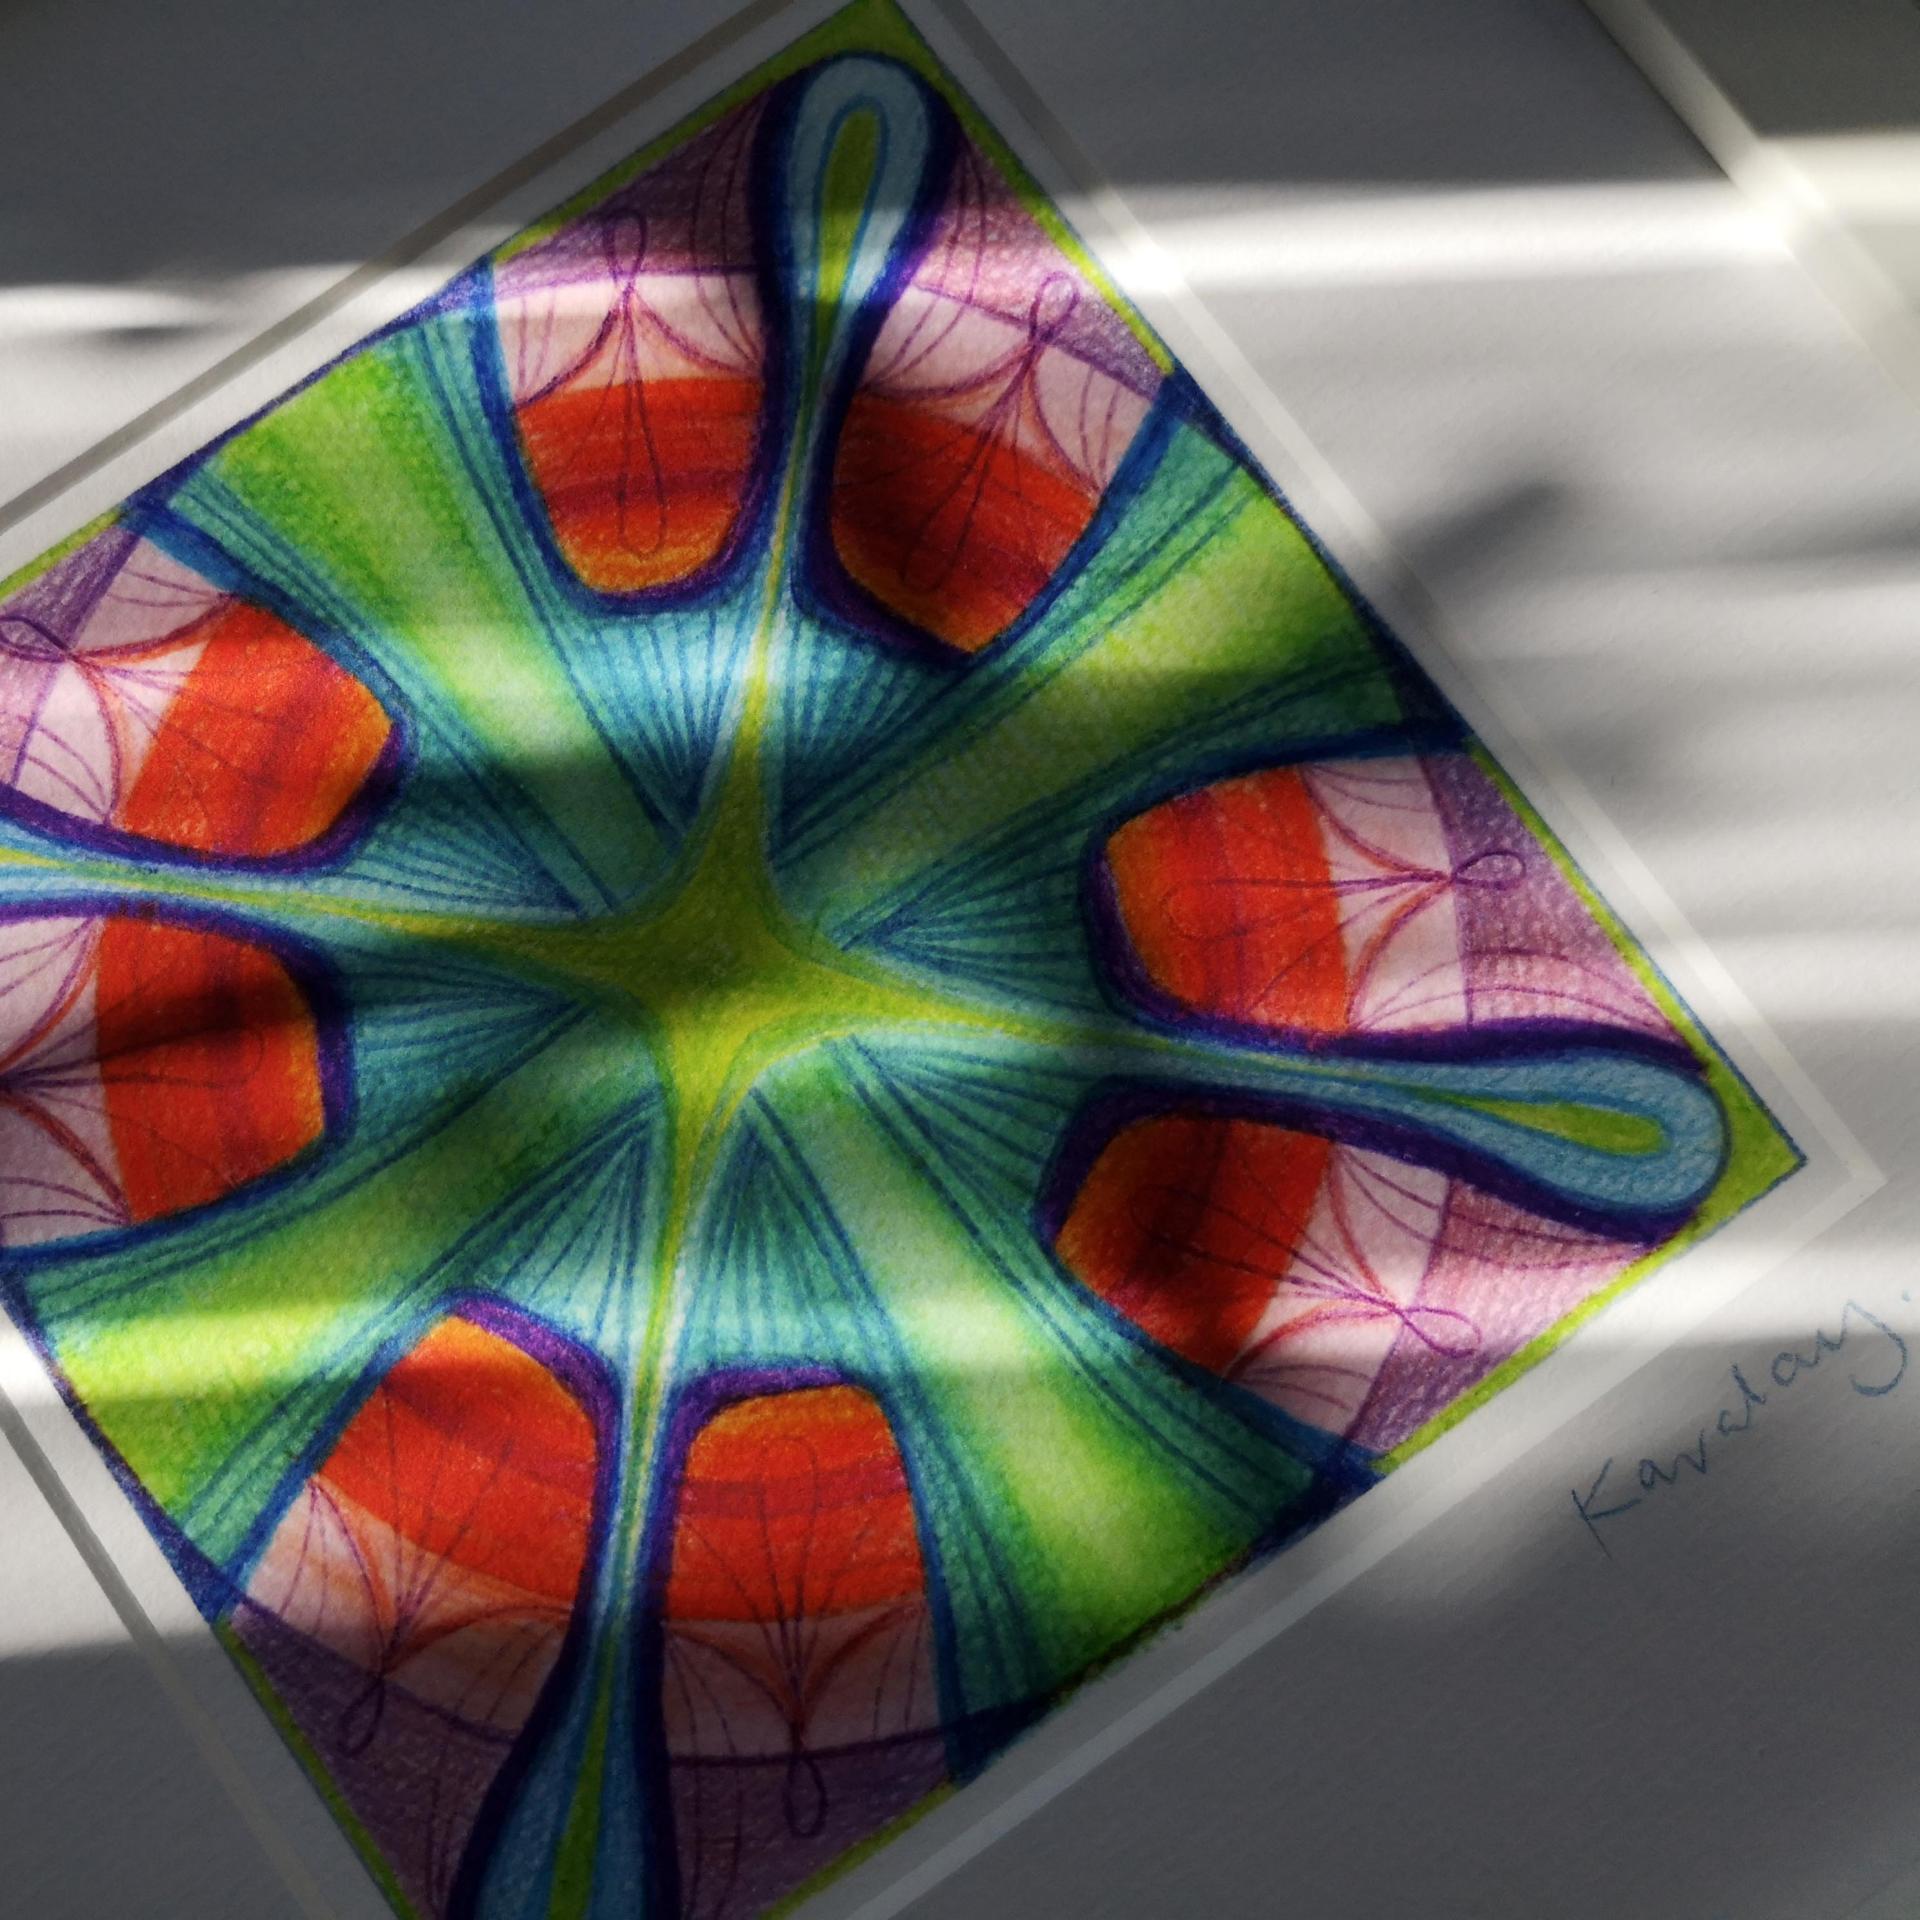 https://karalay.com/wp-content/uploads/2019/07/Karalay_Mandala-Rownowaga_4b-SUN.jpg